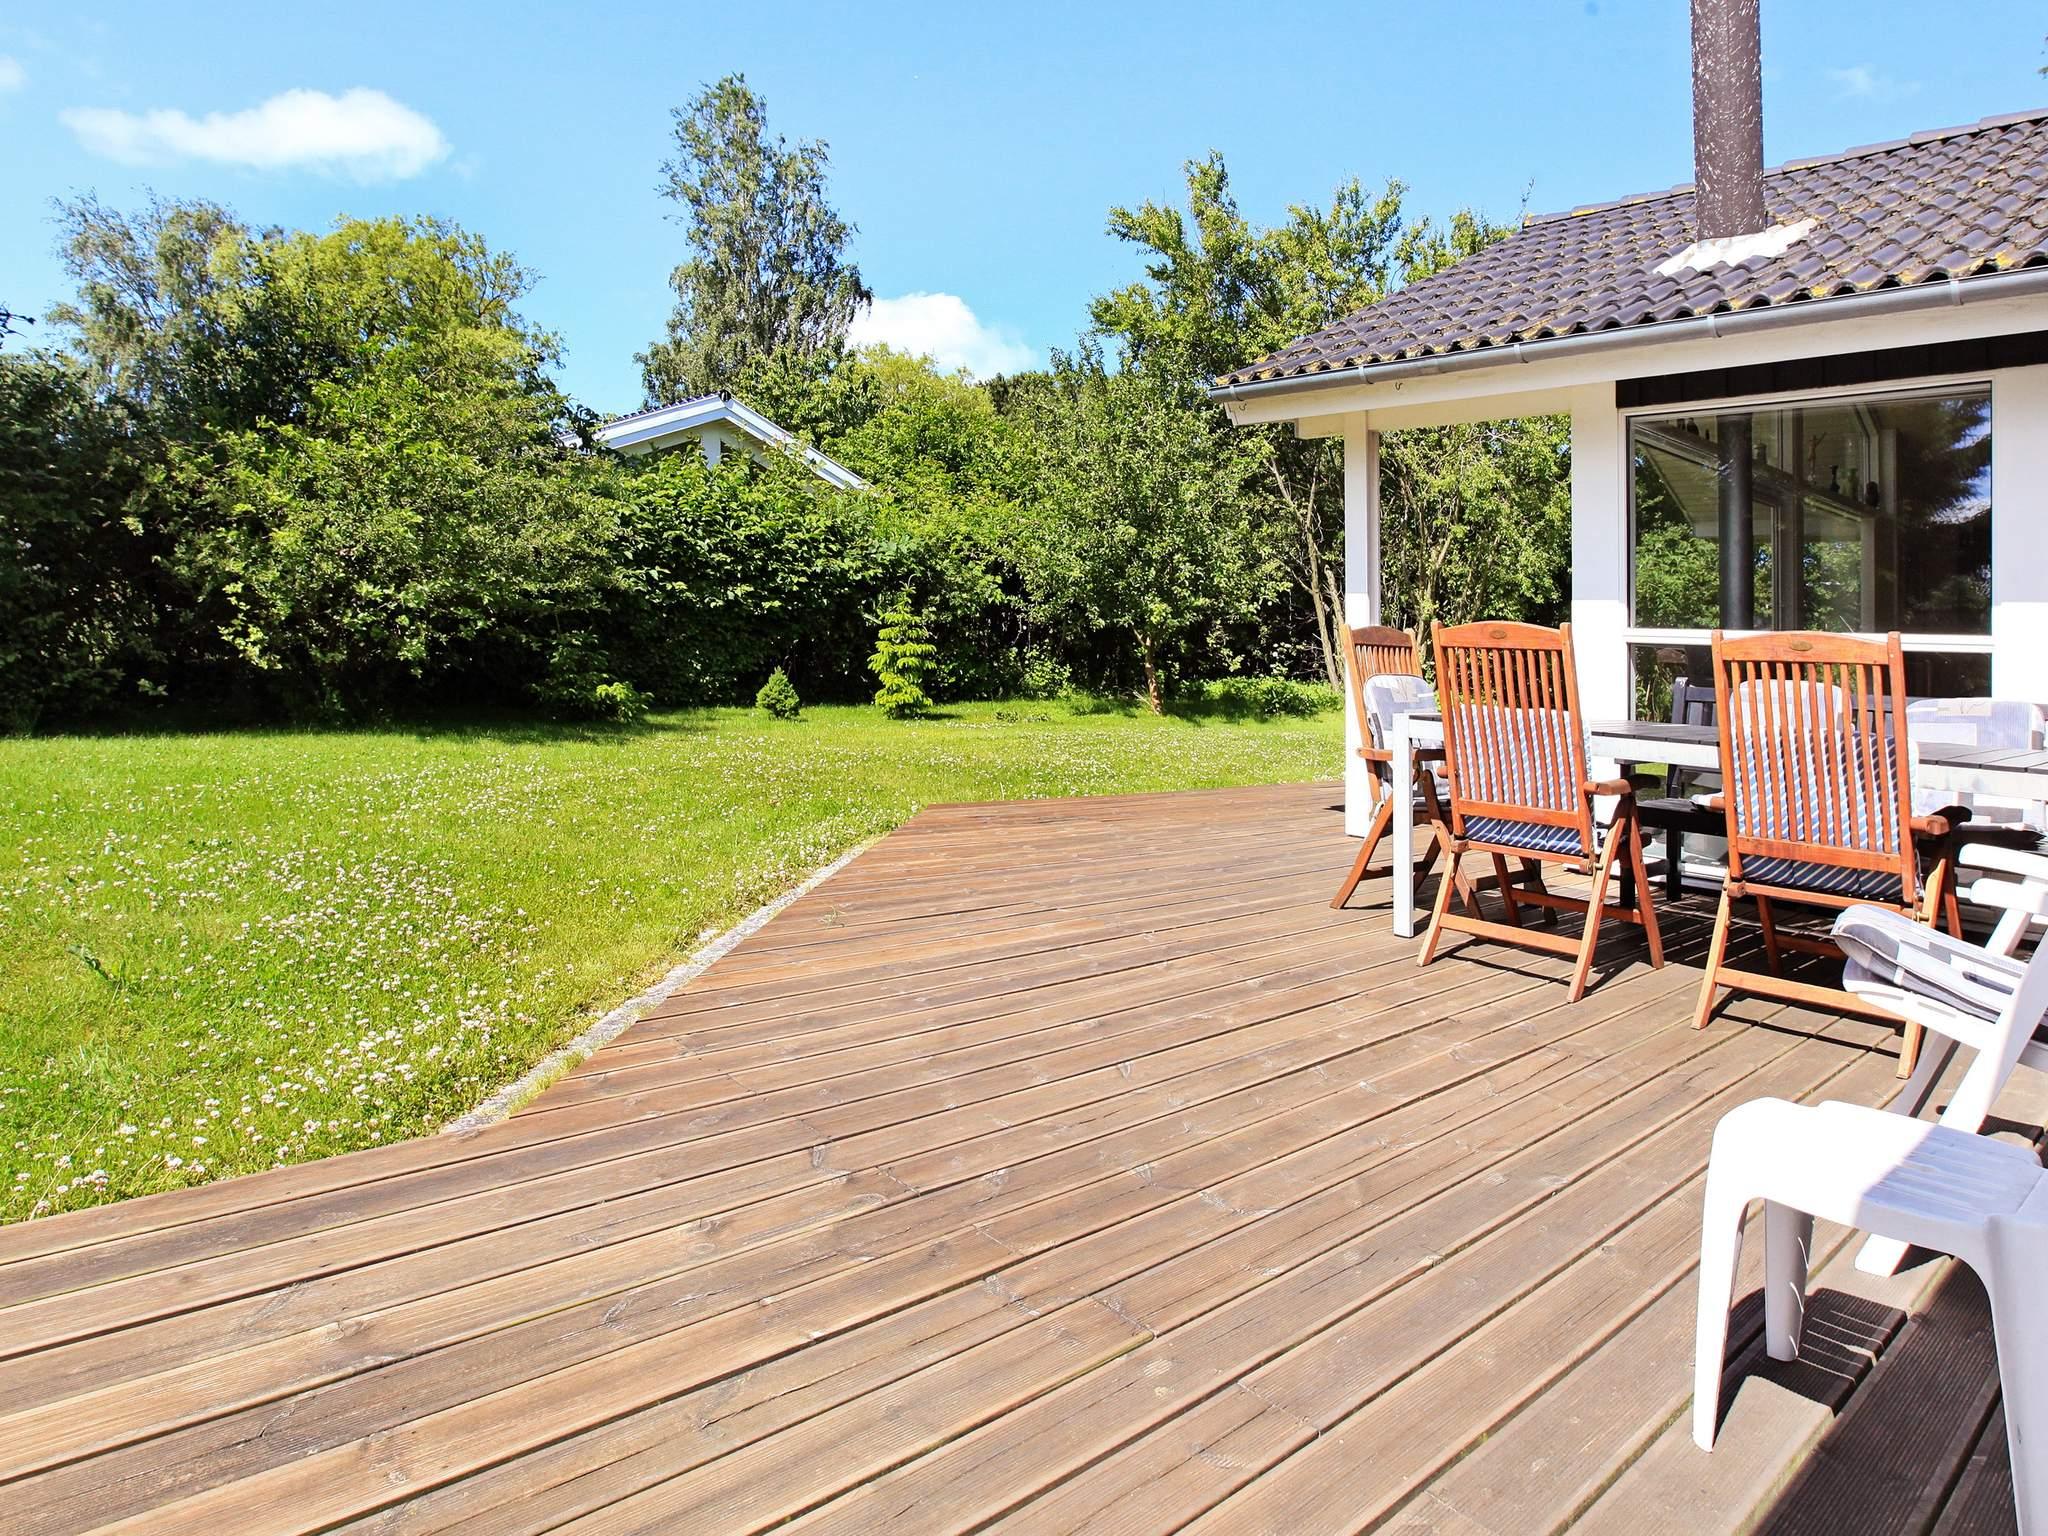 Ferienhaus Vejby Strand (681722), Vejby, , Nordseeland, Dänemark, Bild 20